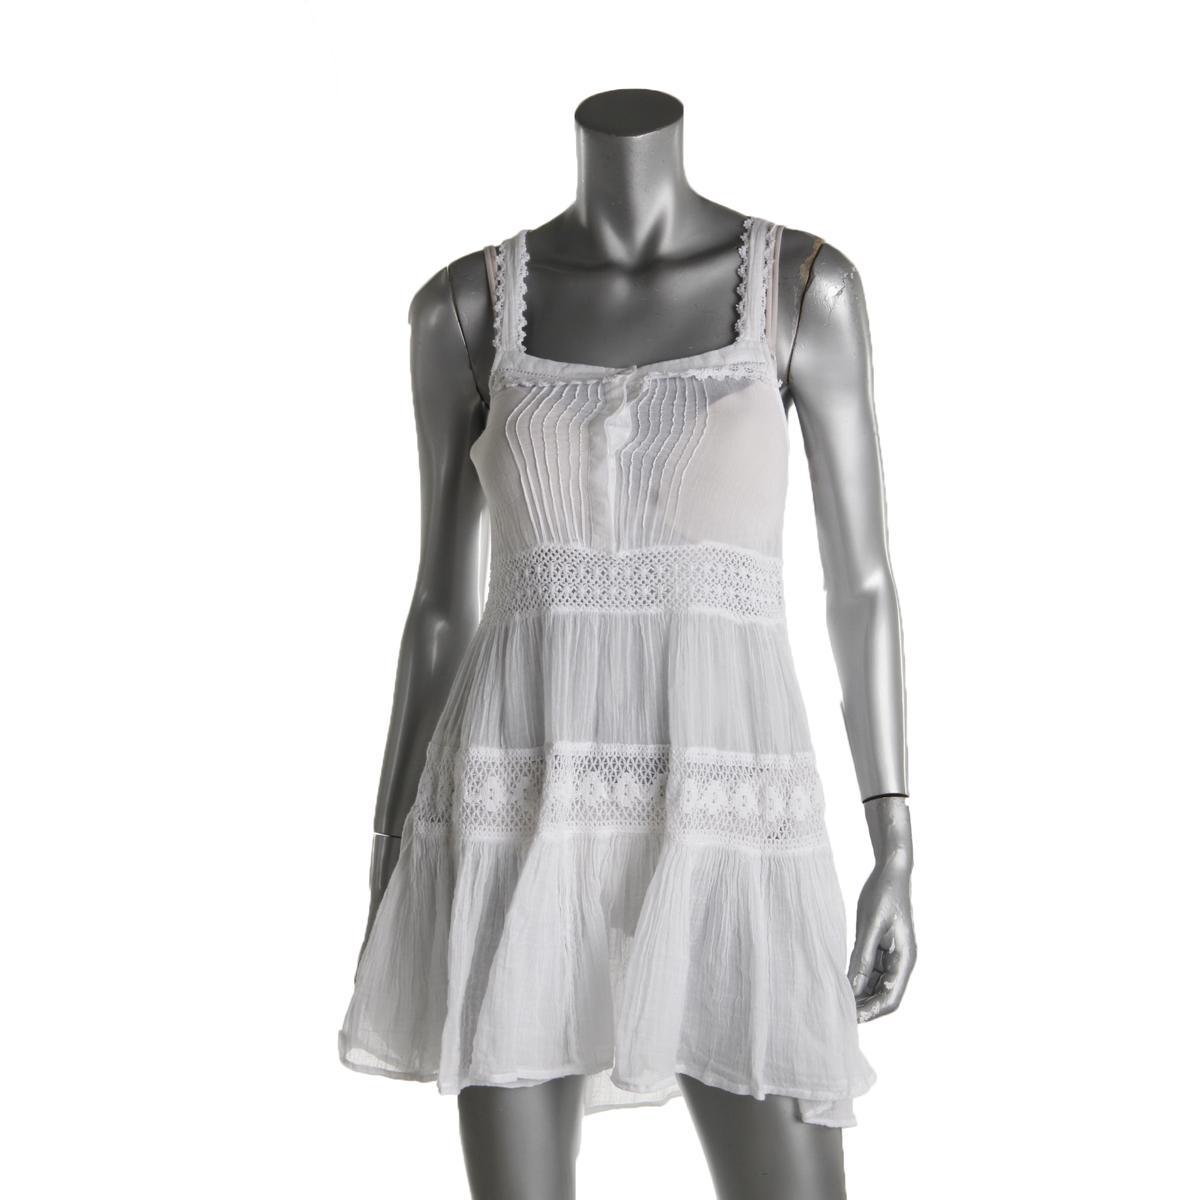 55e5299c374e0 Details about Polo Ralph Lauren Womens Kendall White Gauze Dress Swim Cover- Up XS BHFO 4324